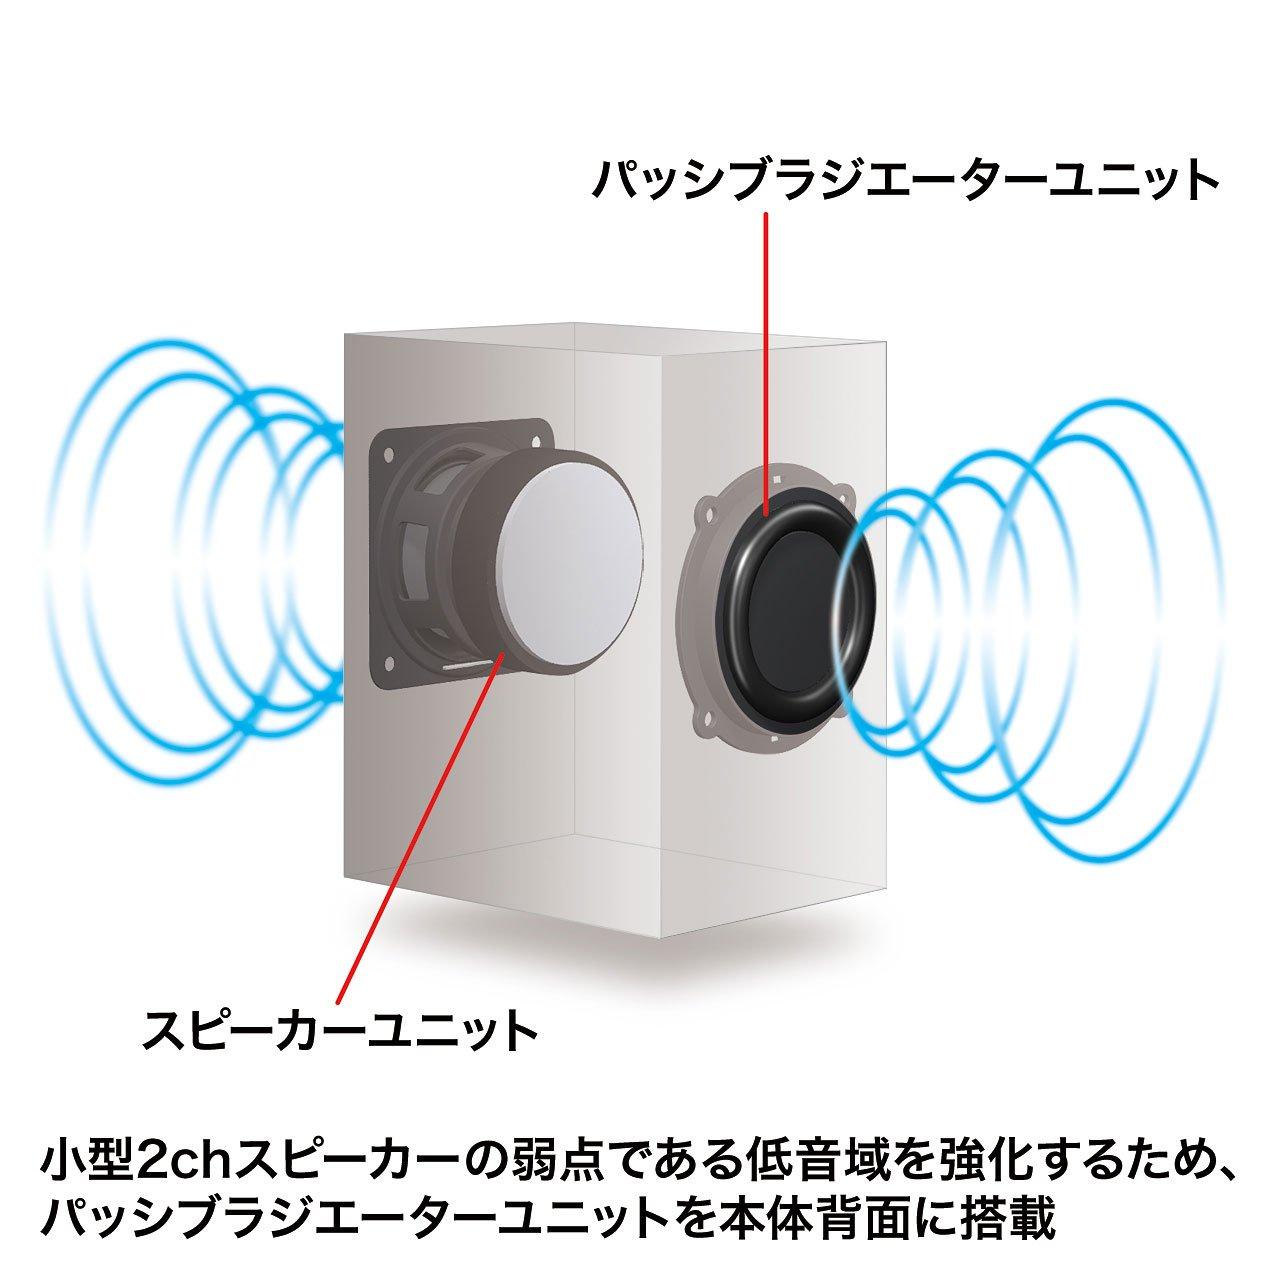 SANWA SUPPLY high-power USB speaker MM-SPU9BK (Black) by Sanwa (Image #5)